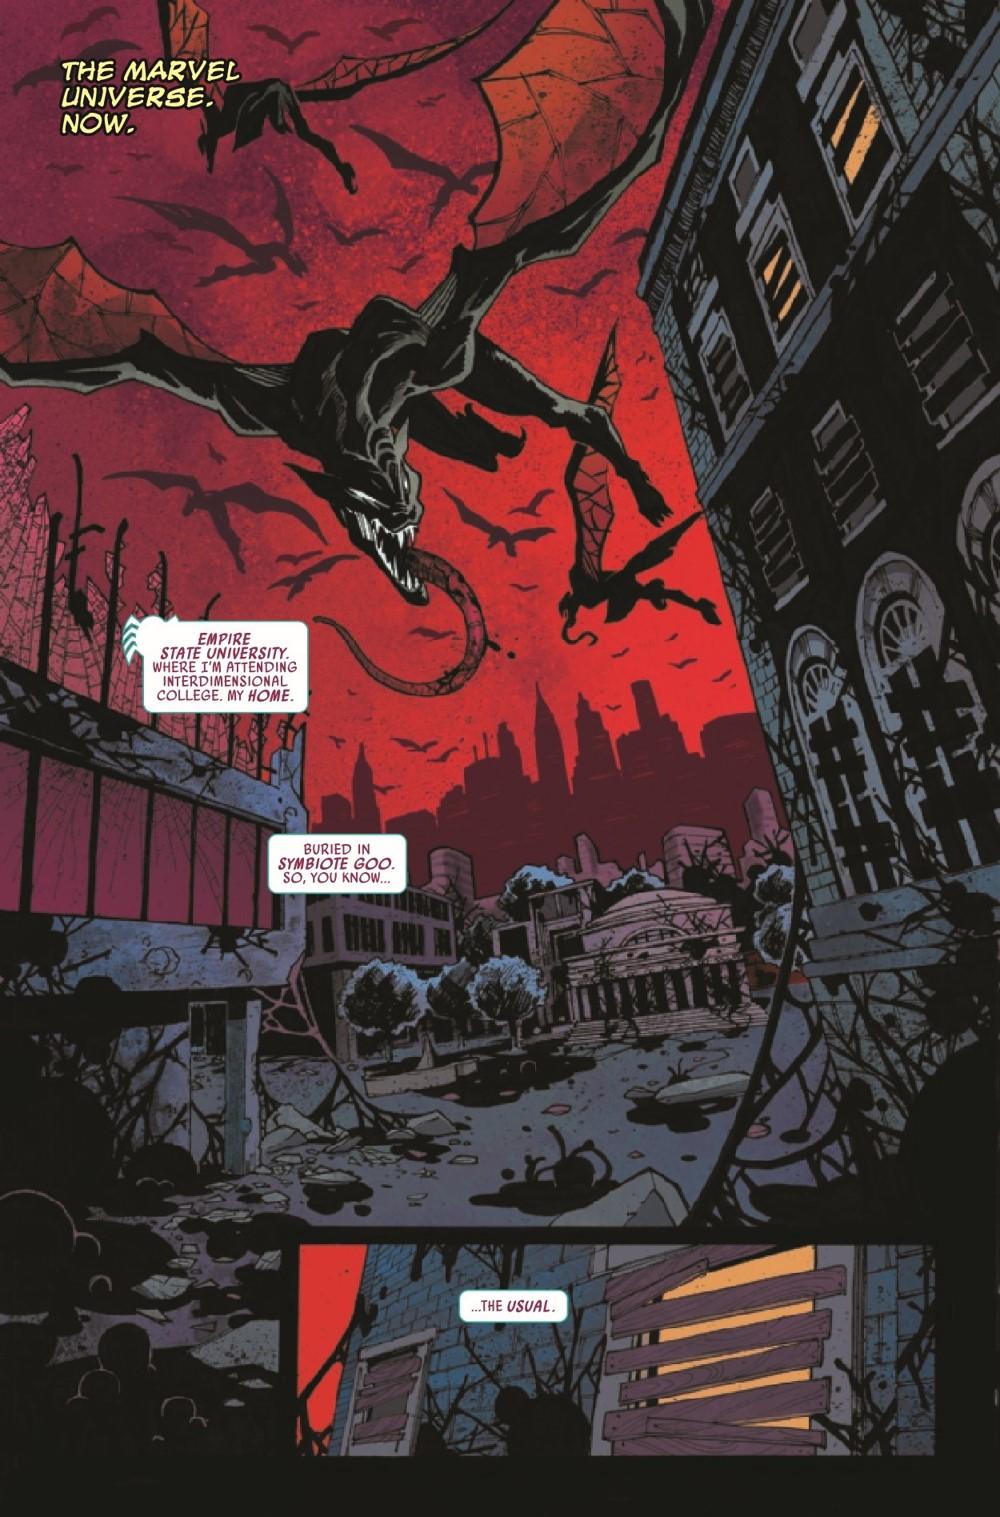 GWENOMVSCARNKIB2021001_Preview-3 ComicList Previews: KING IN BLACK GWENOM VS CARNAGE #1 (OF 3)